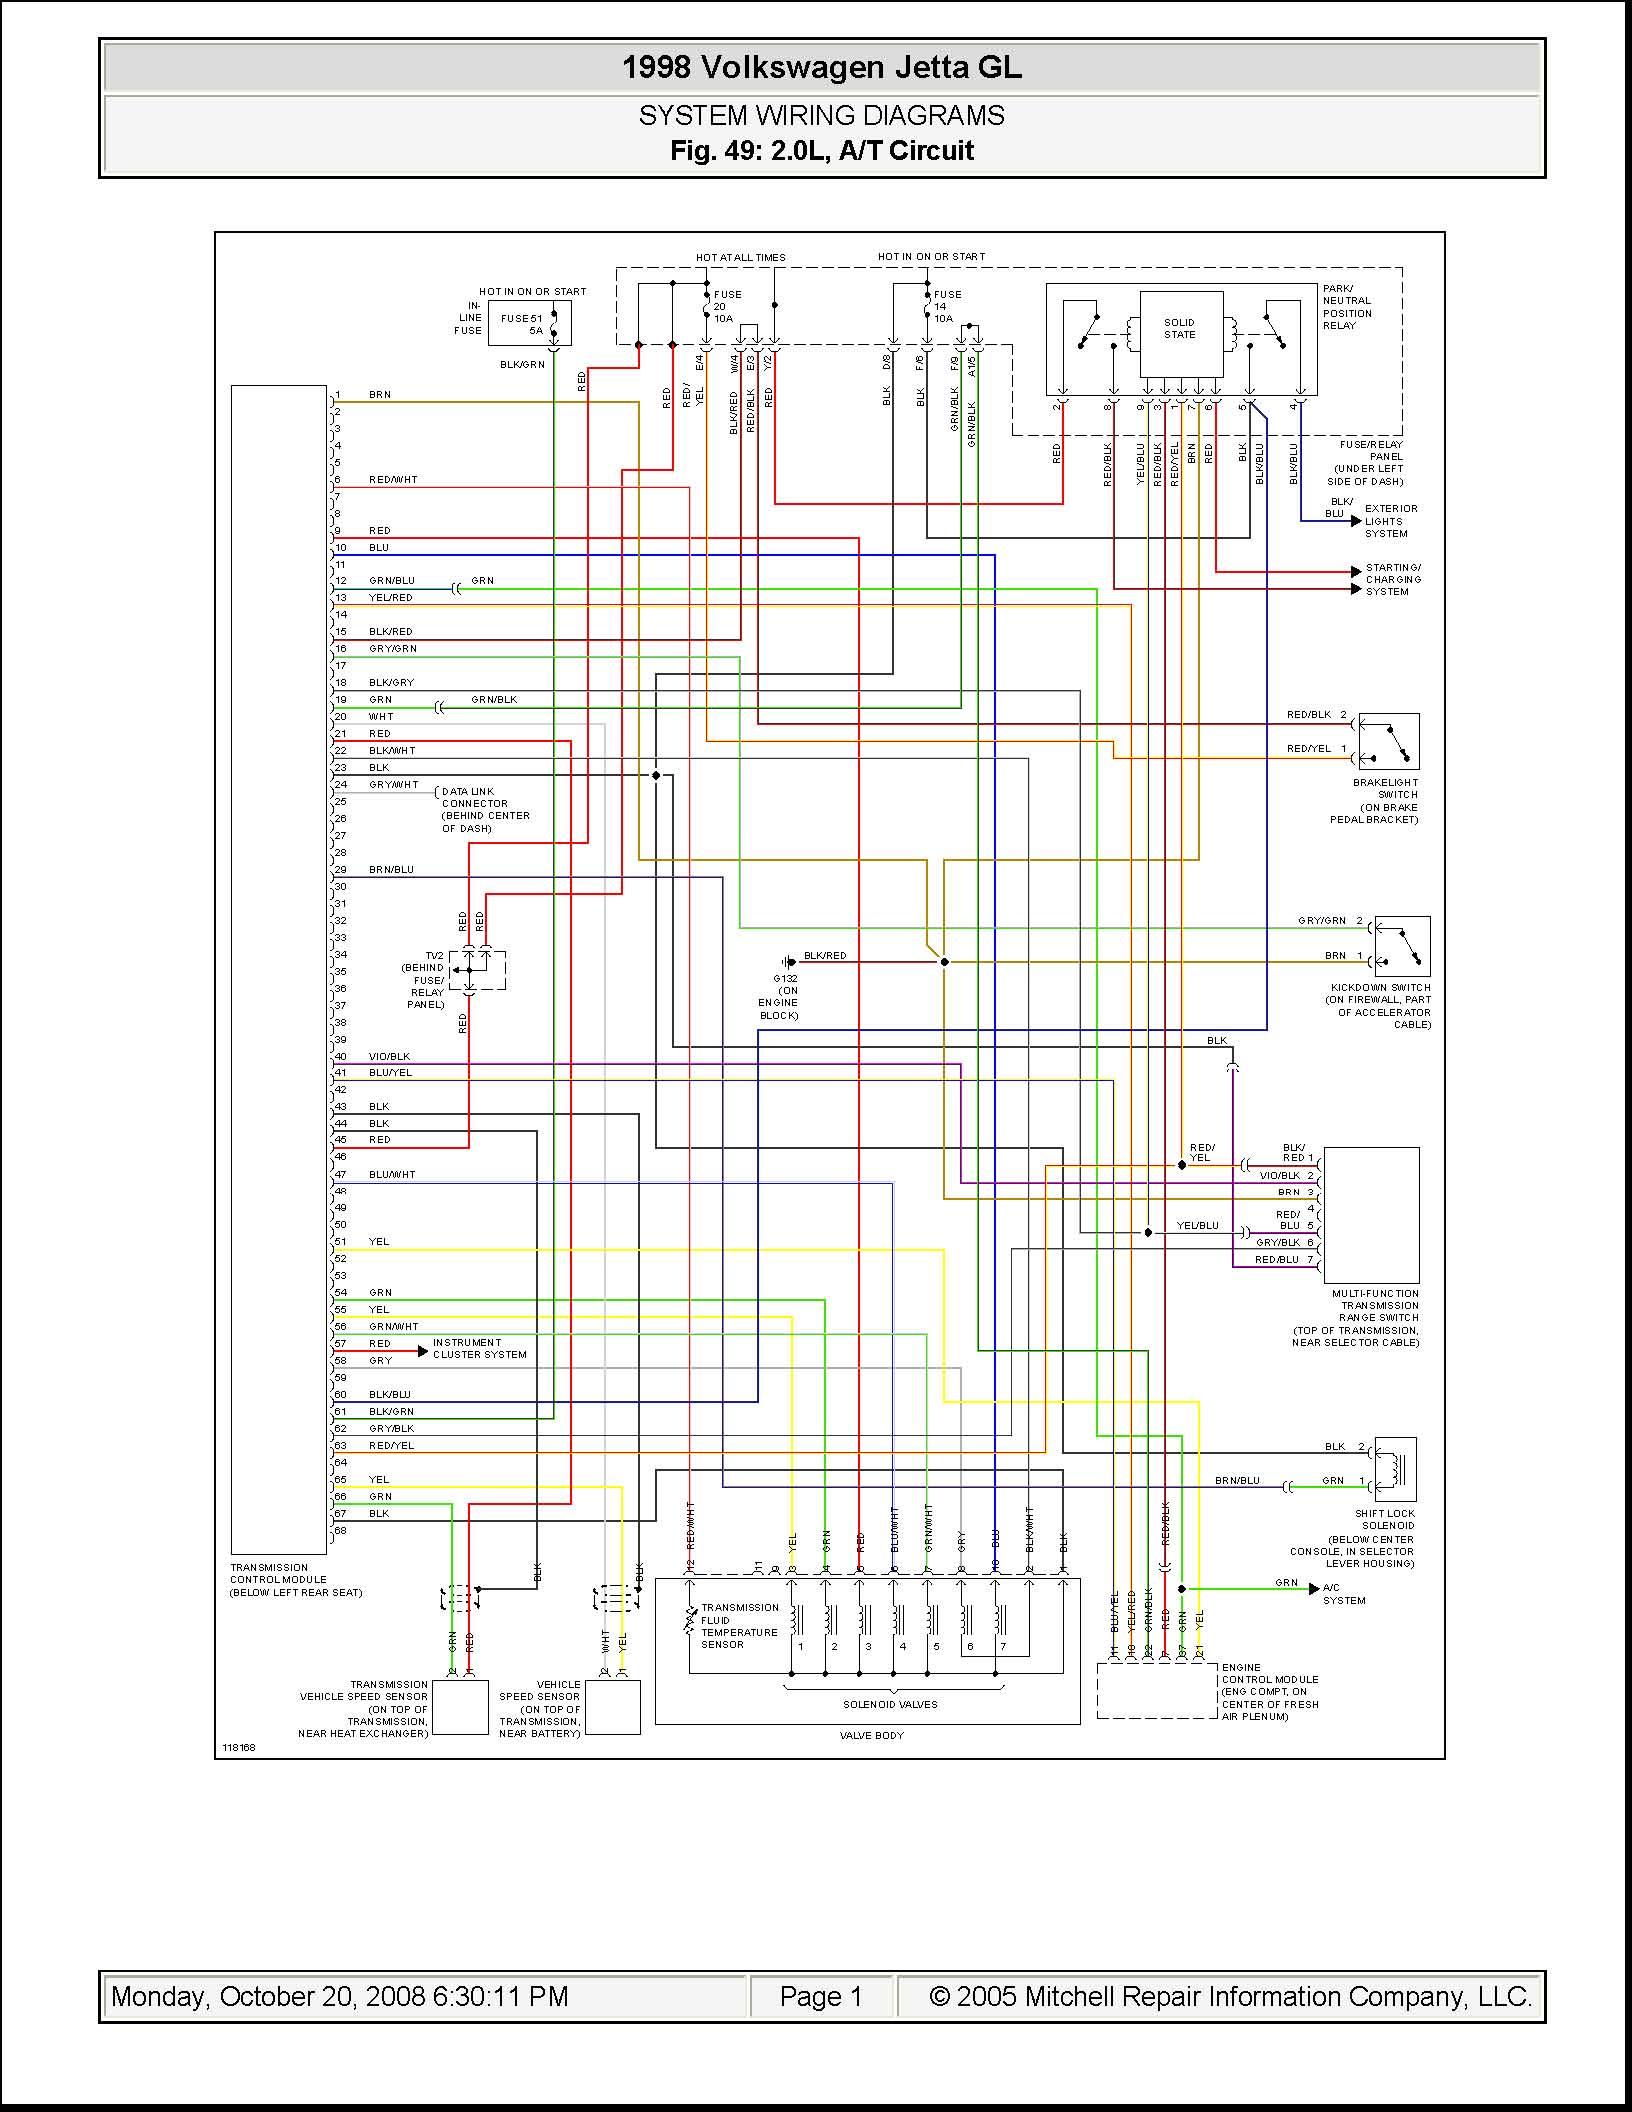 1998 Jetta Tdi Wiring Diagram - Wiring Diagram